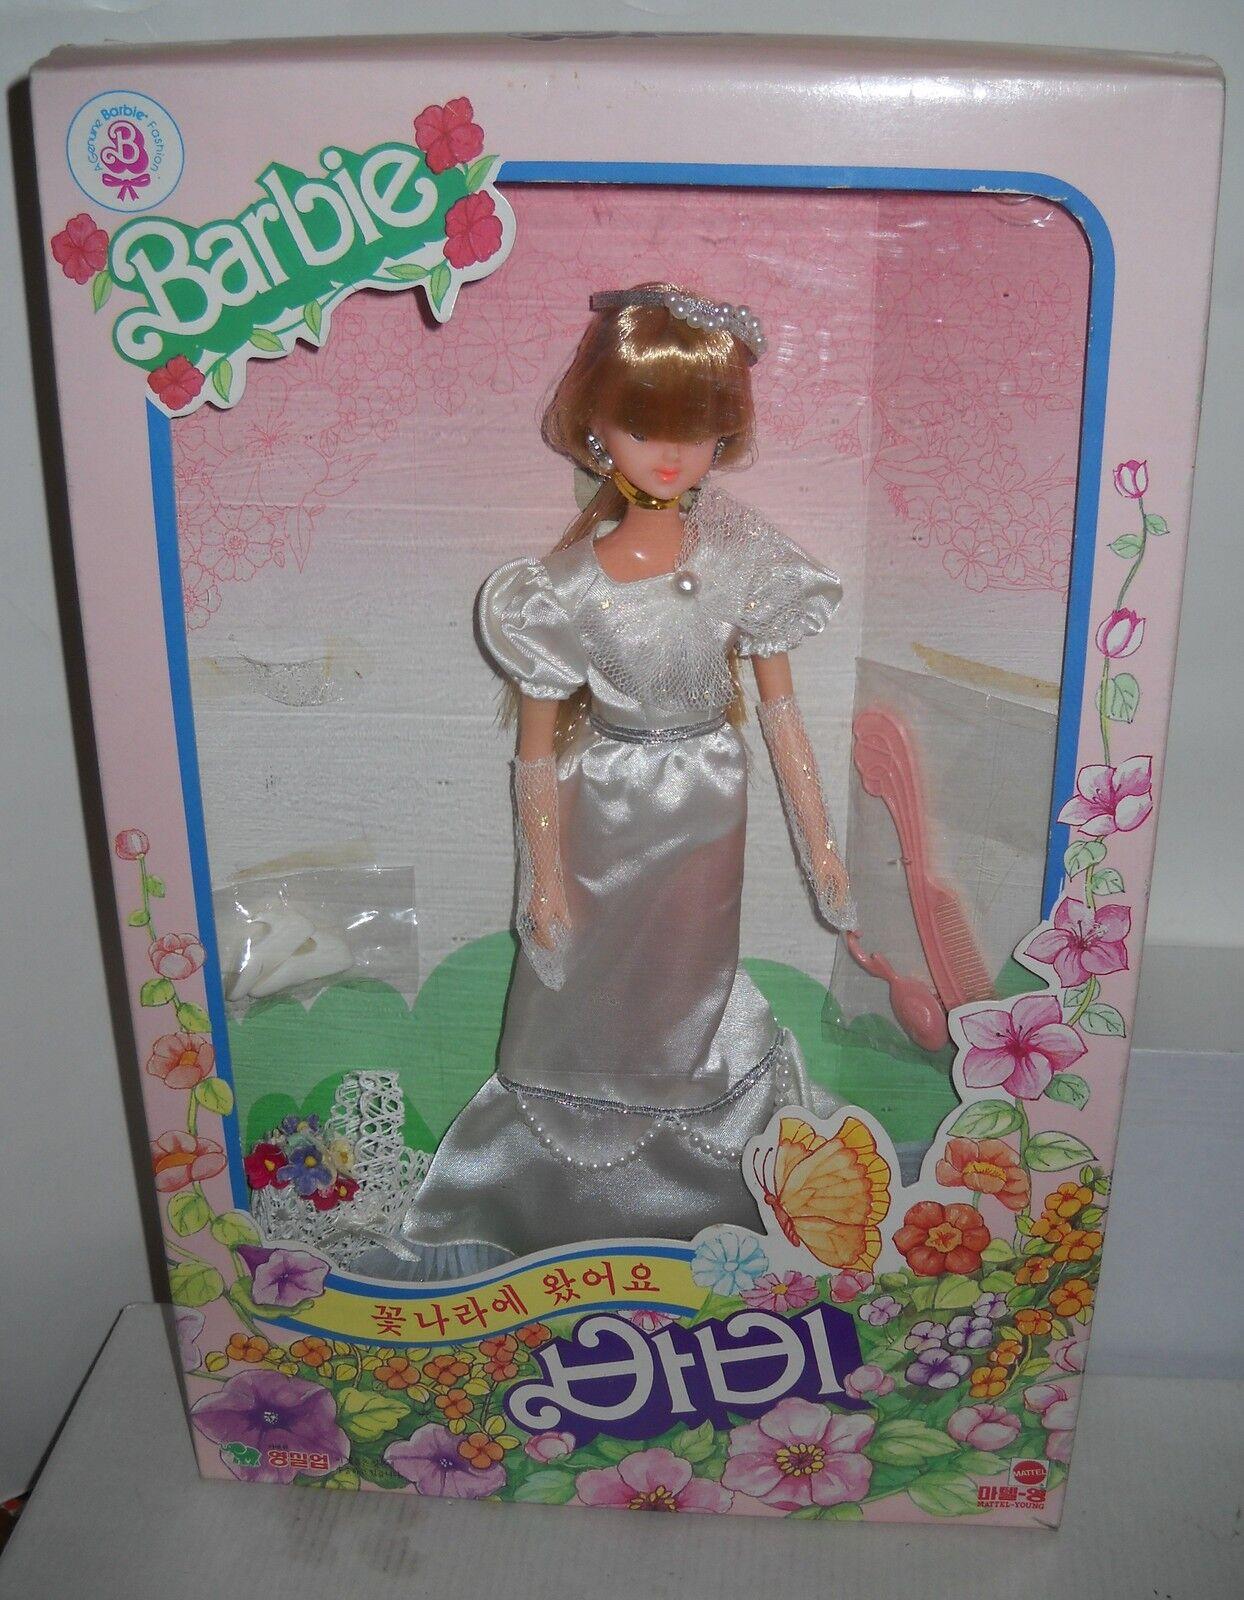 Nuevo En Caja Mattel Muñeca Barbie Moda Corea joven